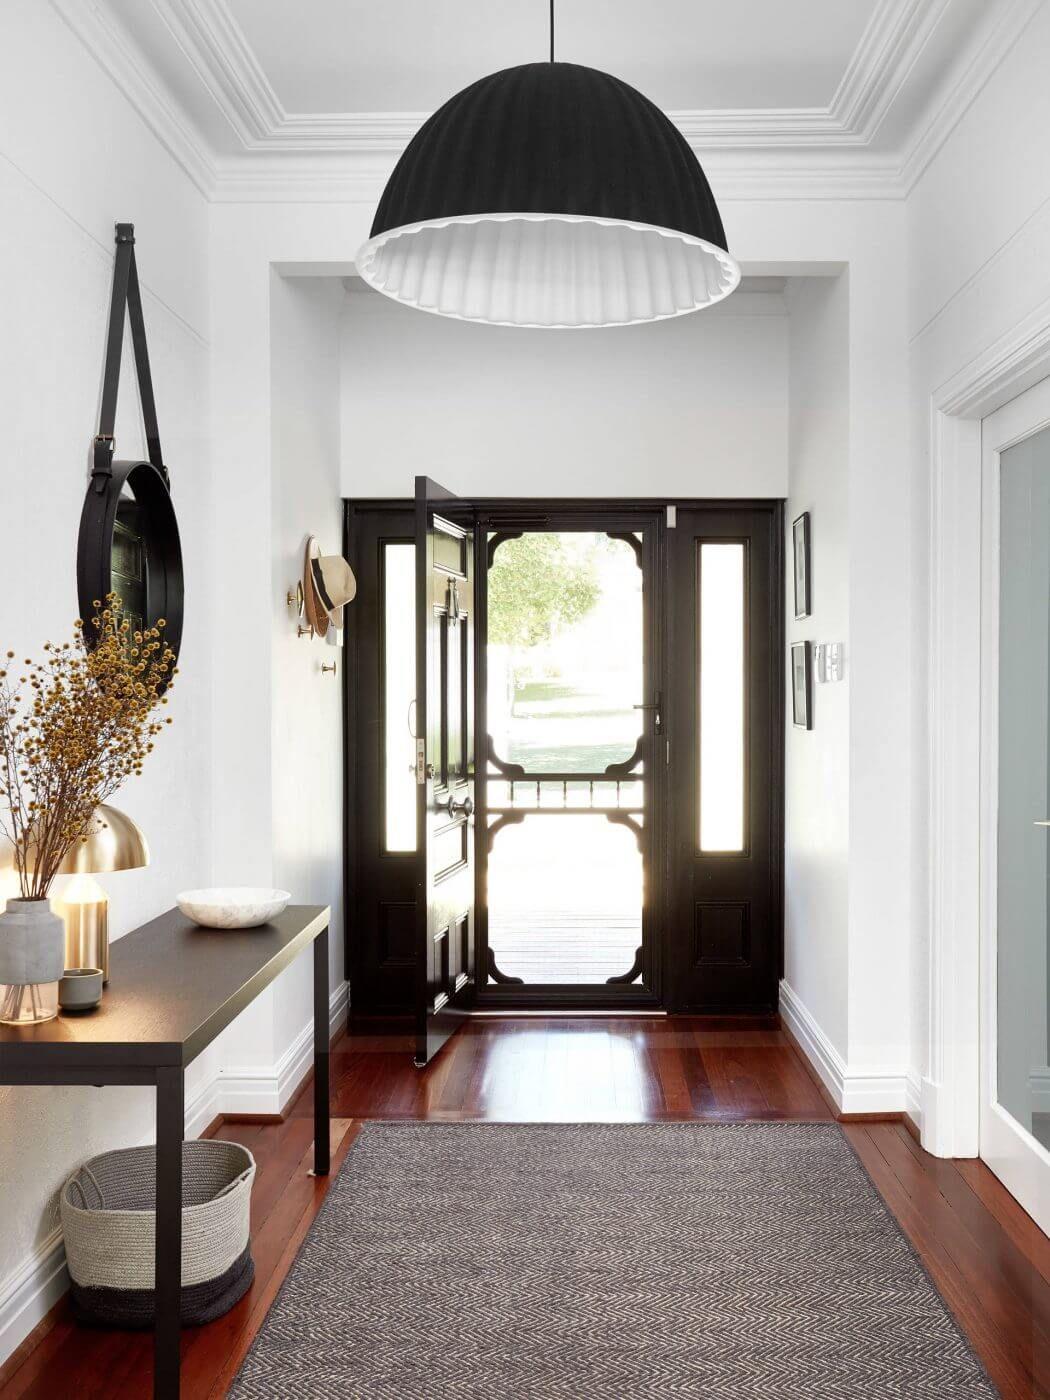 nedlands house by turner interior design architecture interiors